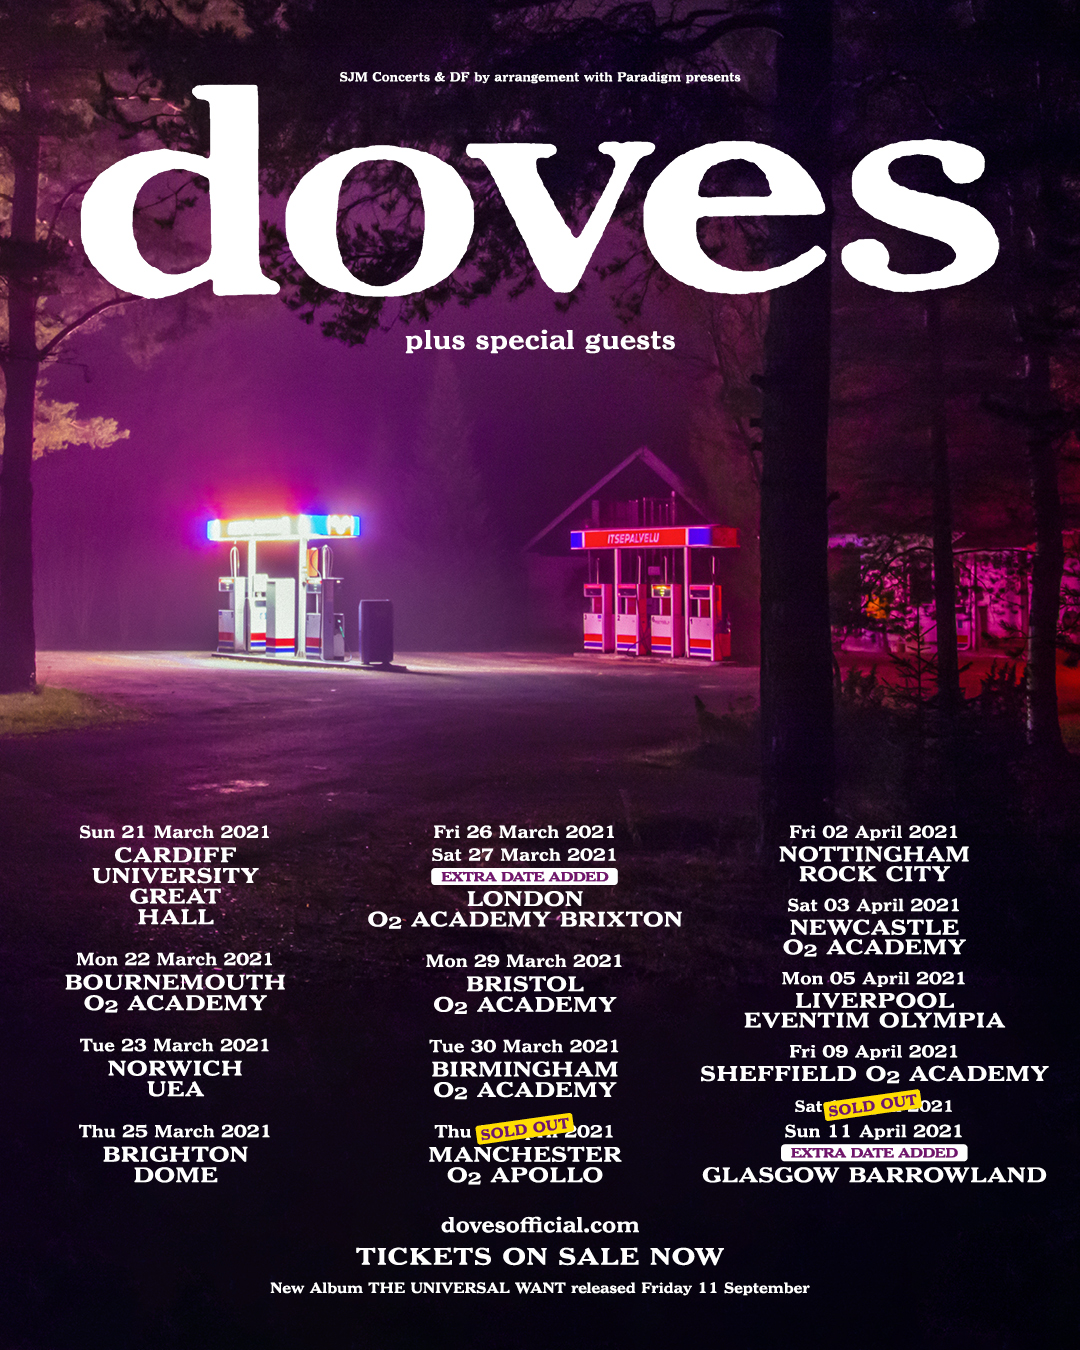 Image for article: UK 2021 UK TOUR EXTRA DATES ADDED